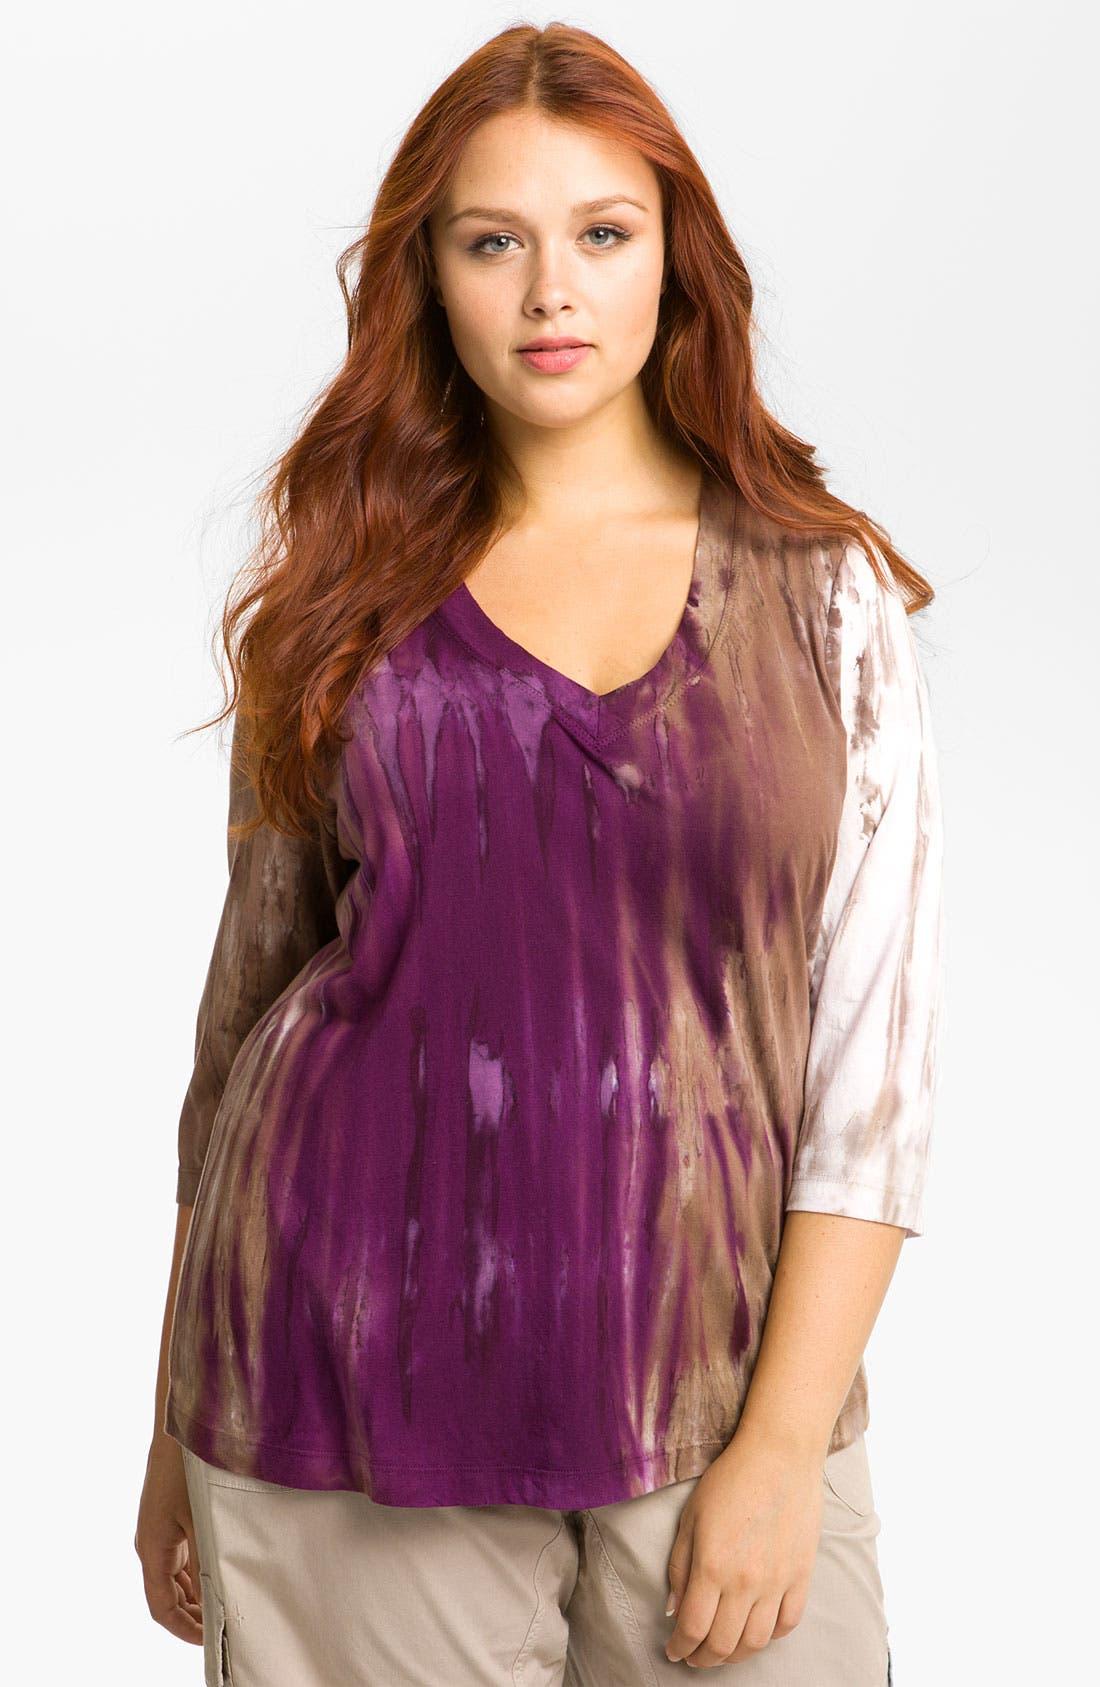 Alternate Image 1 Selected - XCVI Wearables Burnout V-Neck Top (Plus)